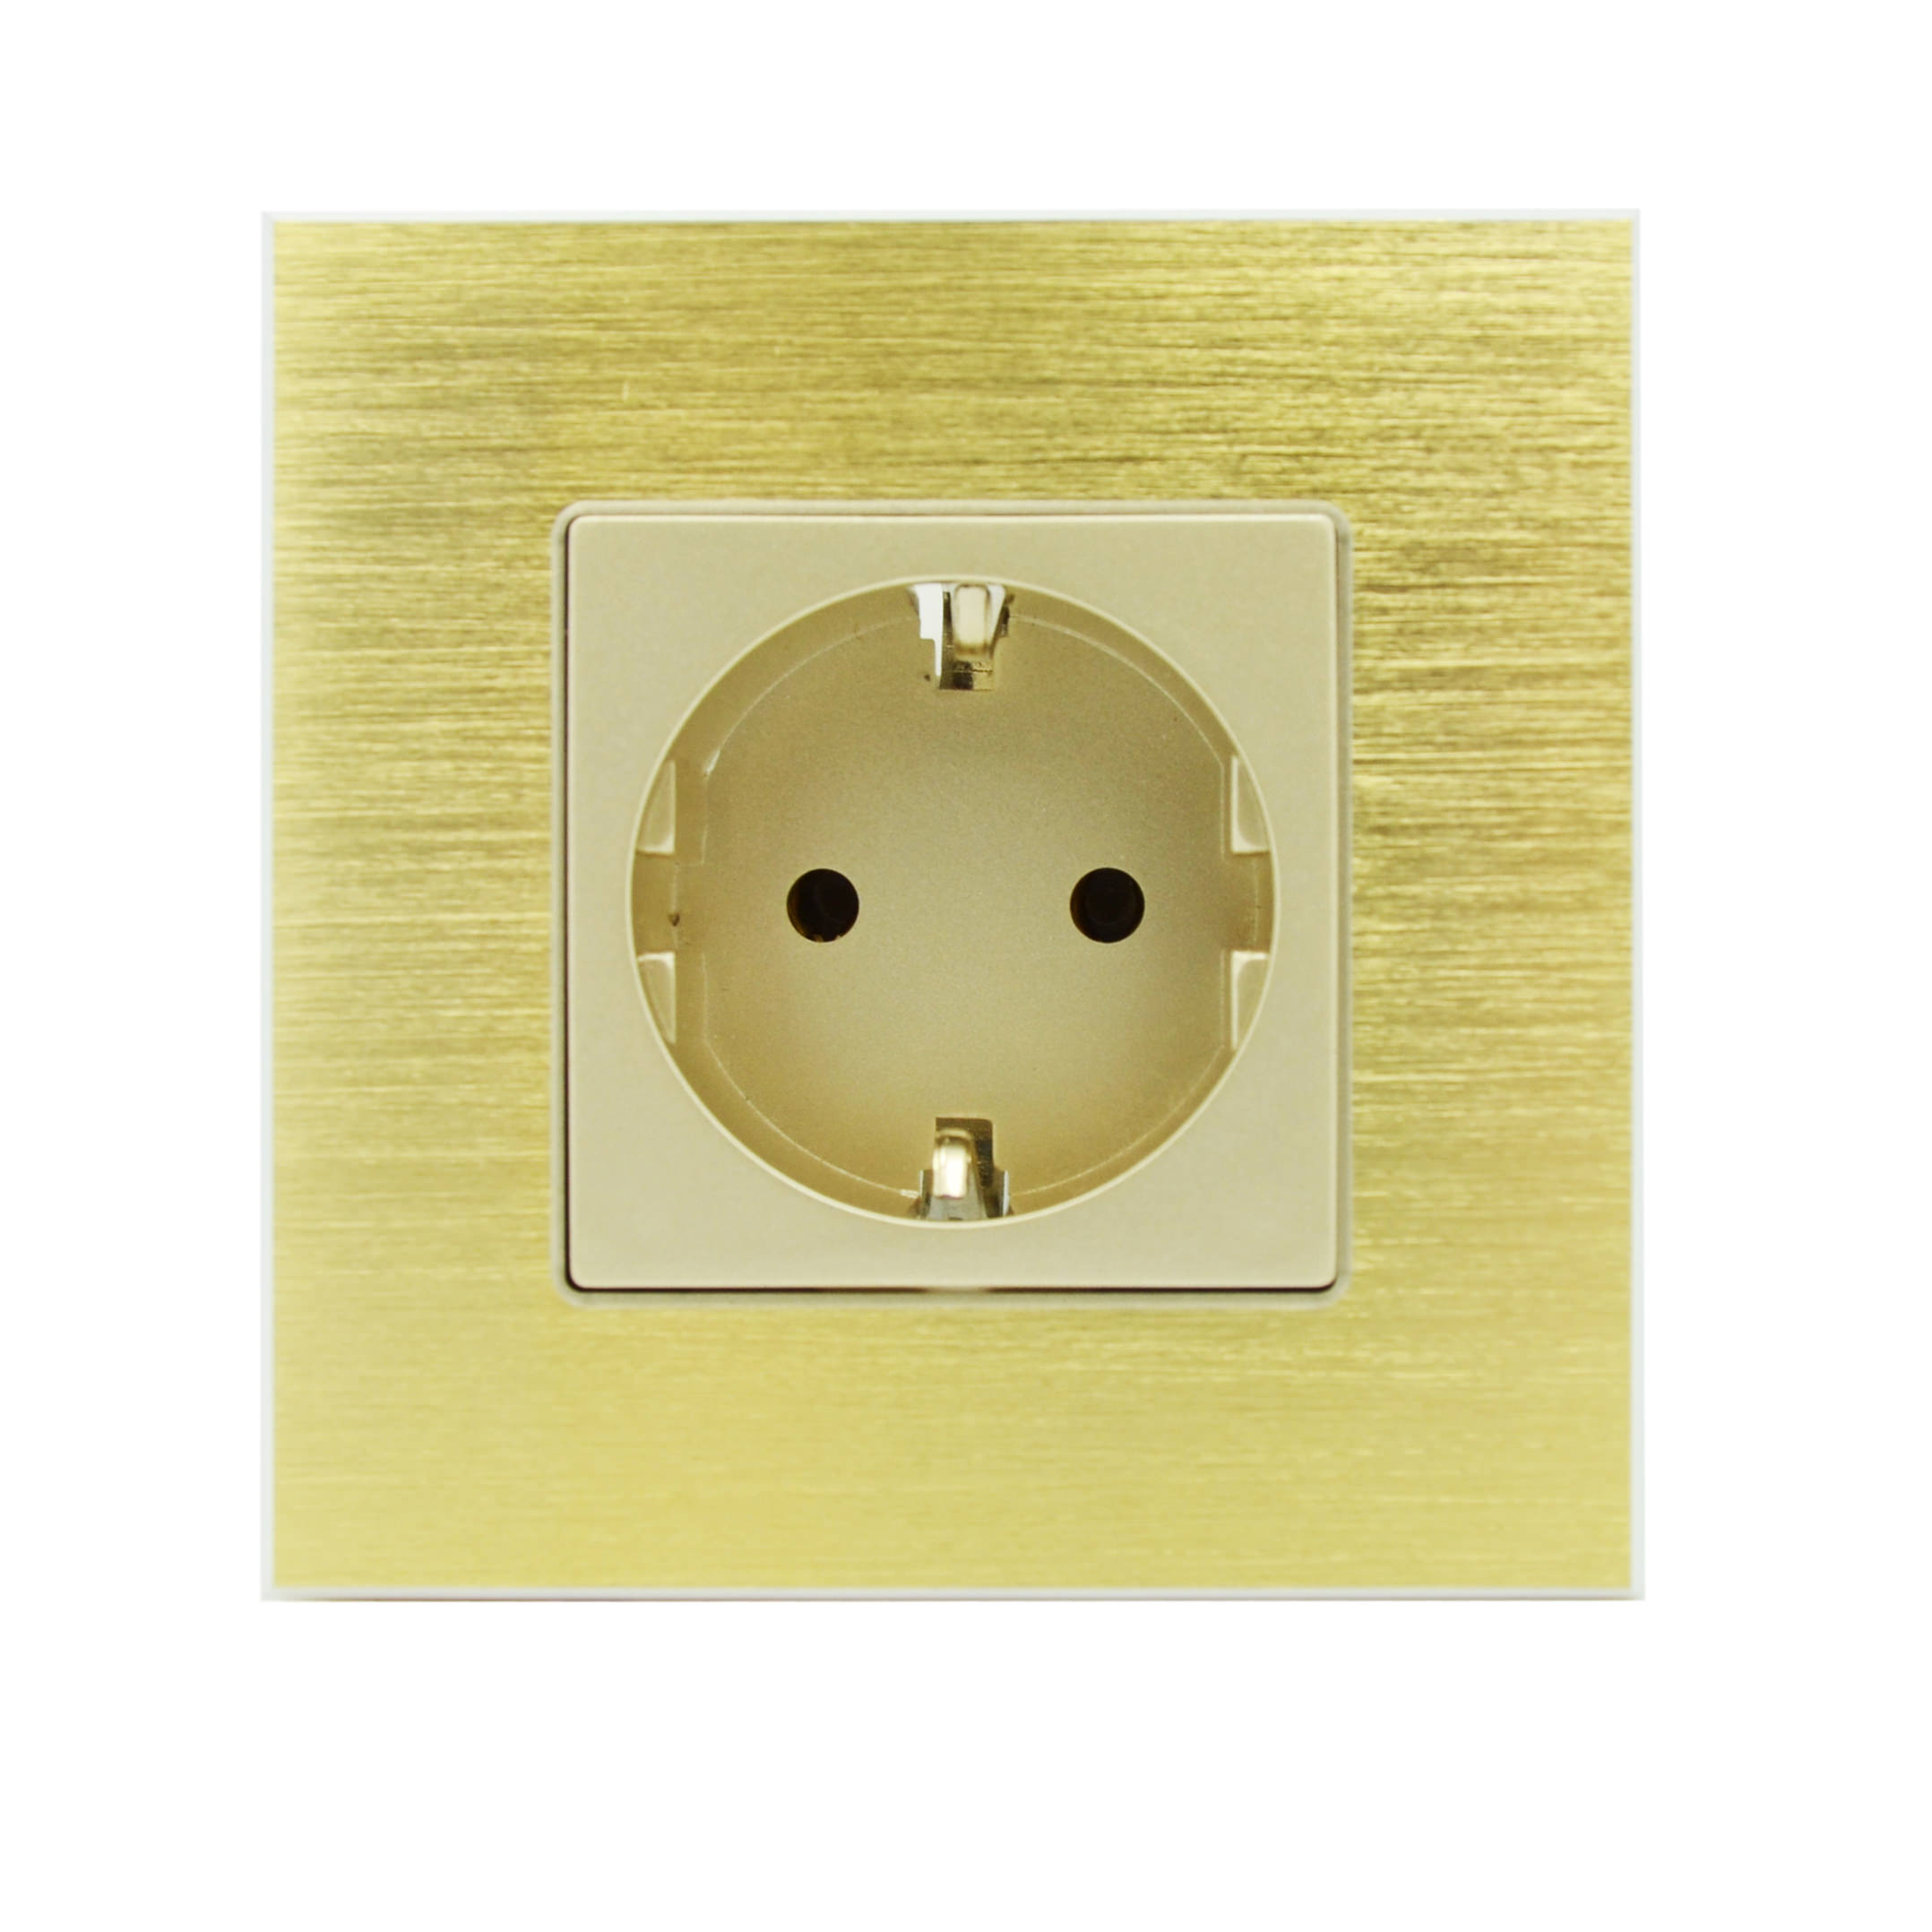 steckdose aluminium gold gold 1 fach neu ebay. Black Bedroom Furniture Sets. Home Design Ideas